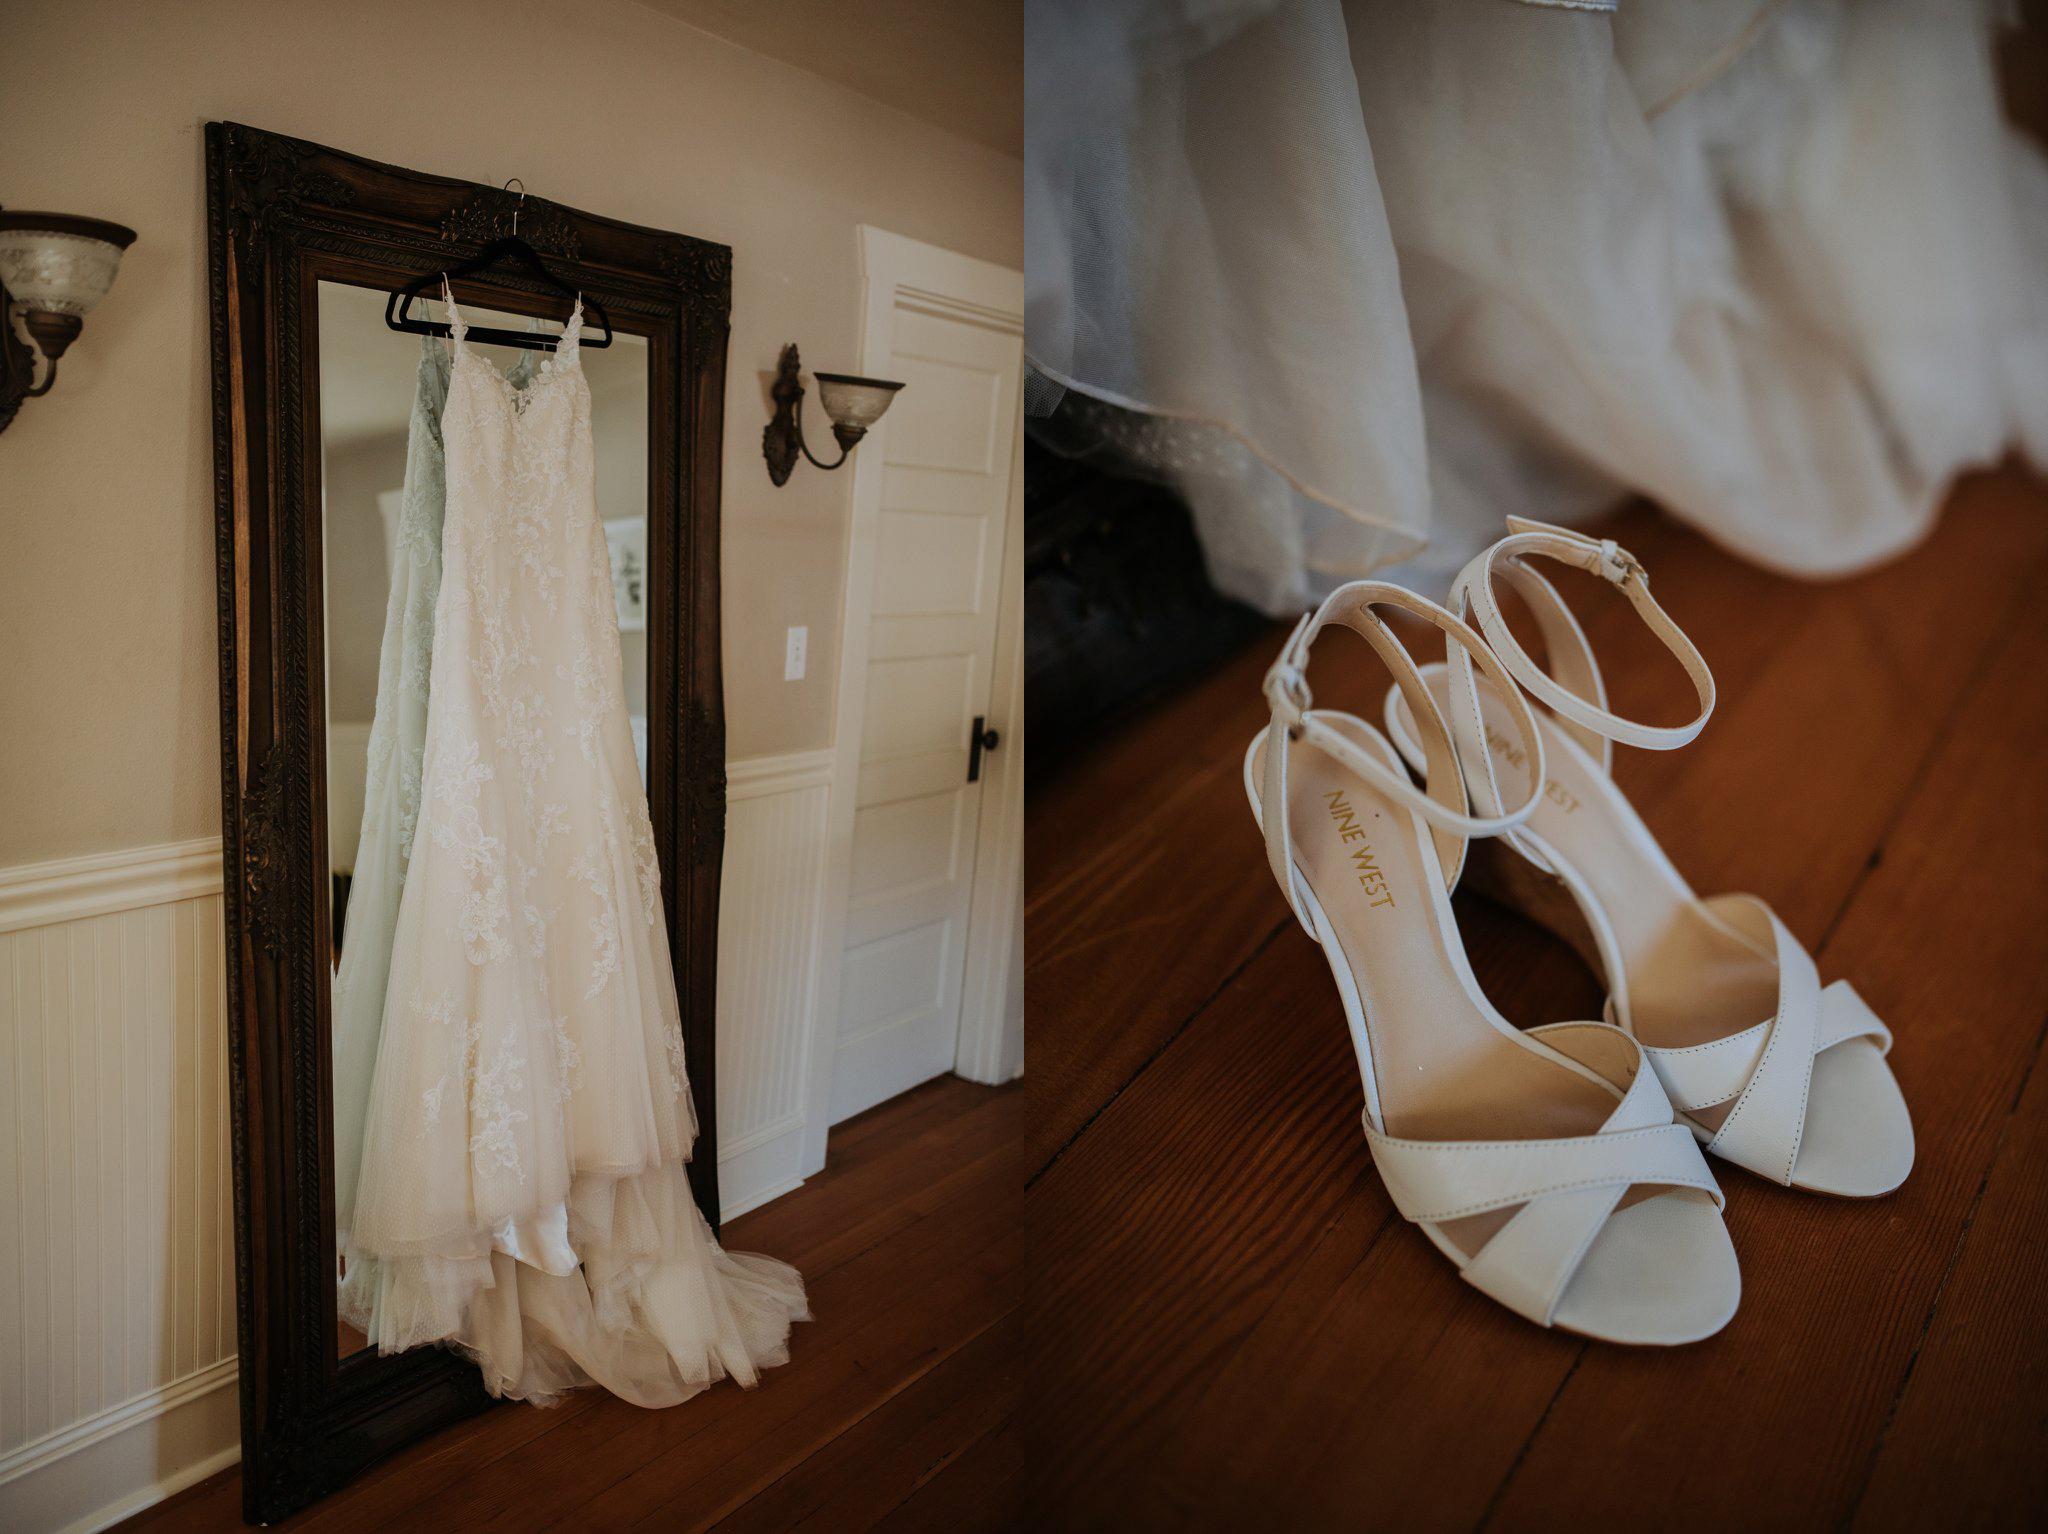 kristen-and-cody-the-kelley-farm-wedding-seattle-photographer-caitlyn-nikula-2.jpg